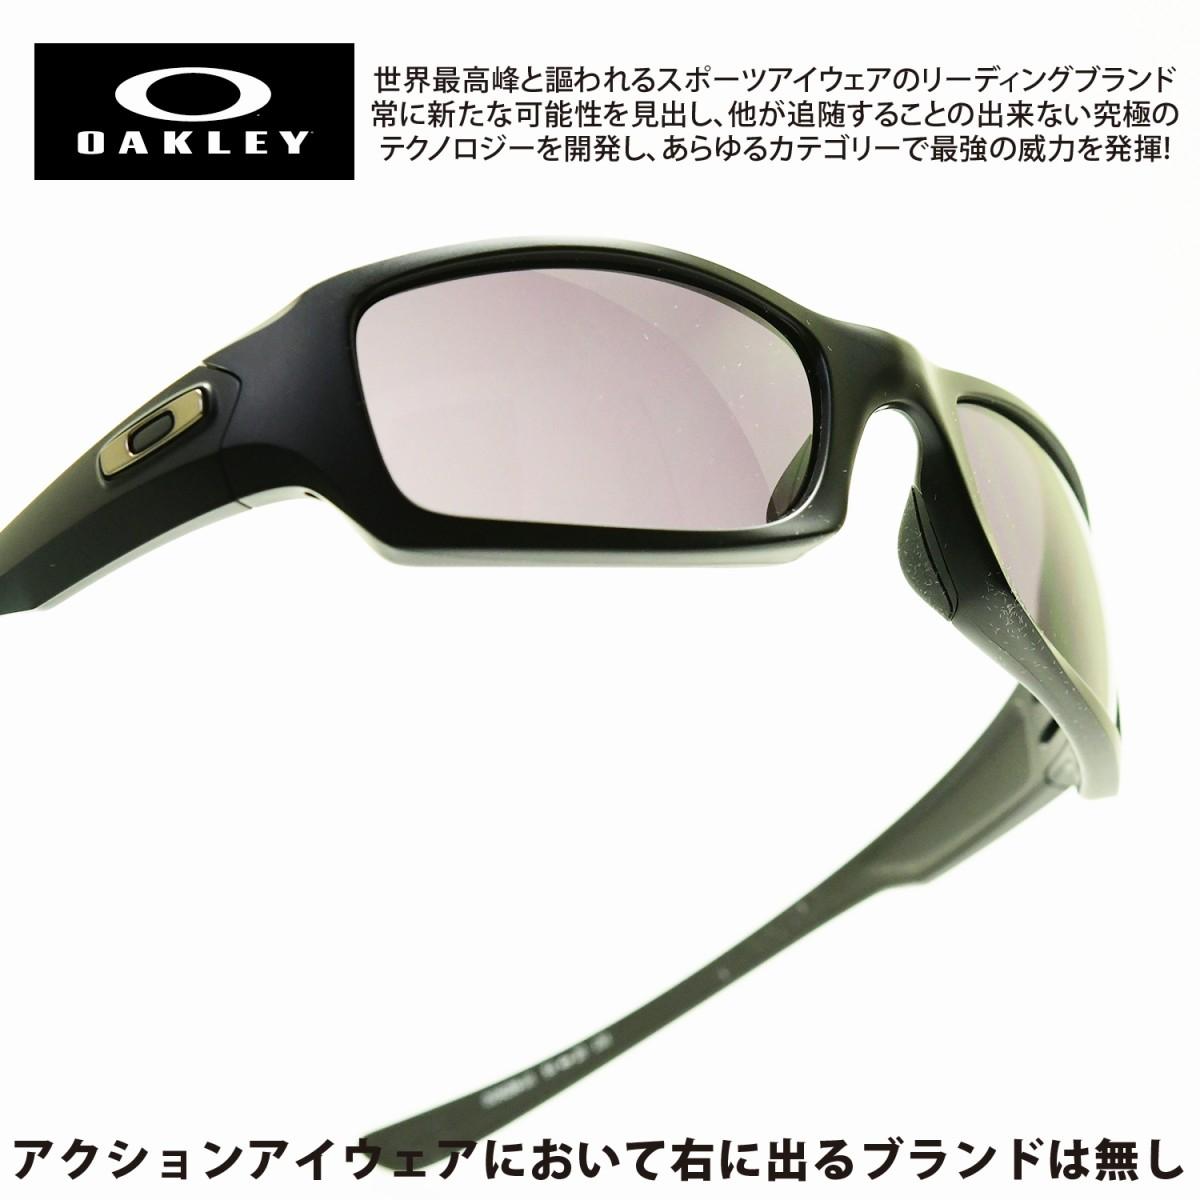 OAKLEY オークリーFIVES SQUARED ファイブススクエアード SIシリーズ USフィットMATTE BLACK/WARM GREY OO9238-10